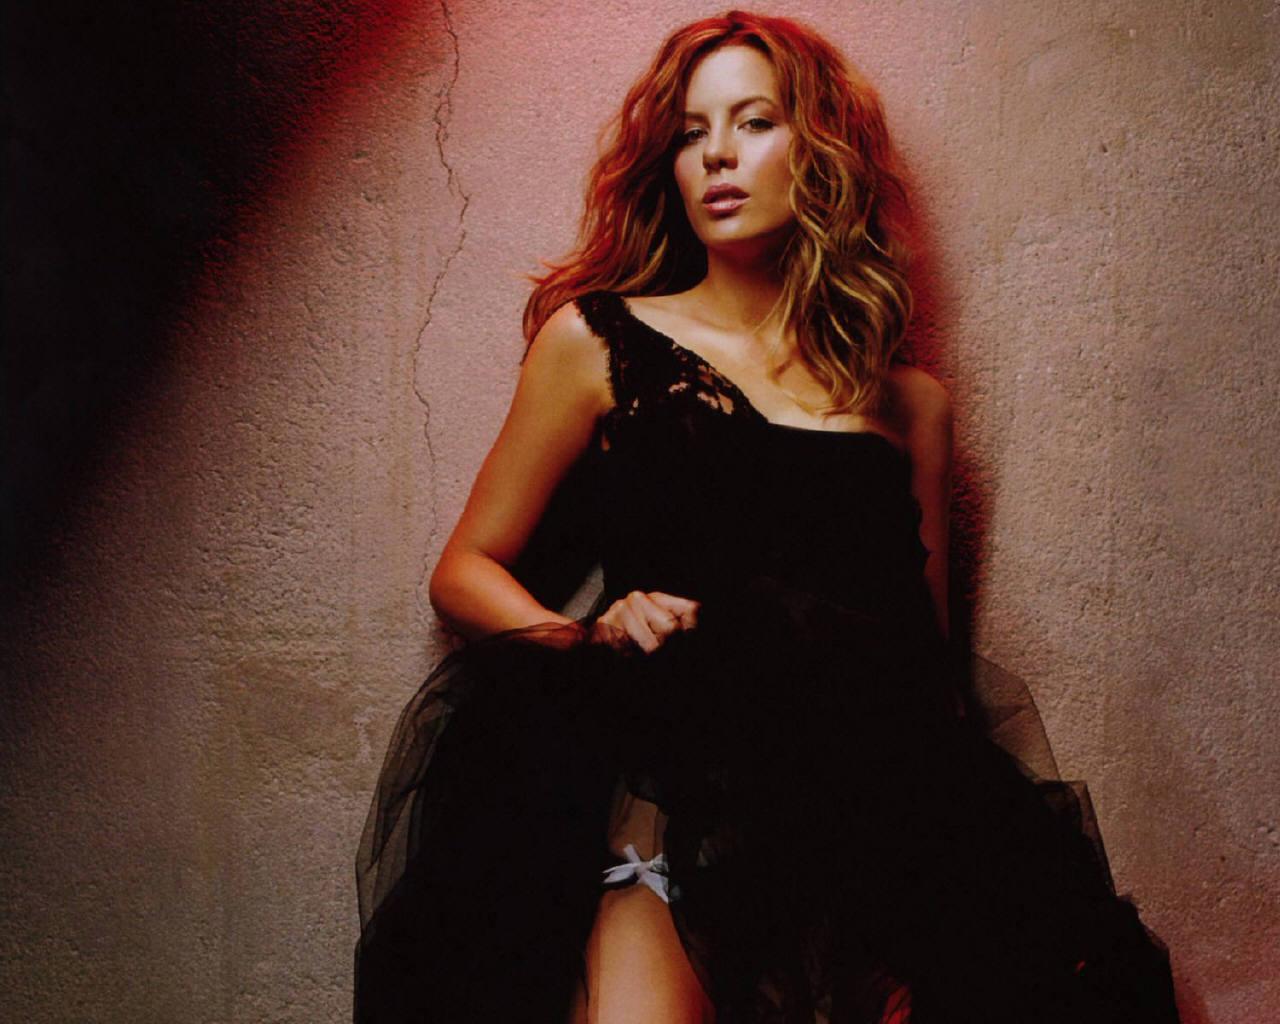 Kate Beckinsale - Kate Beckinsale Wallpaper (78856) - Fanpop Kate Beckinsale Wallpaper